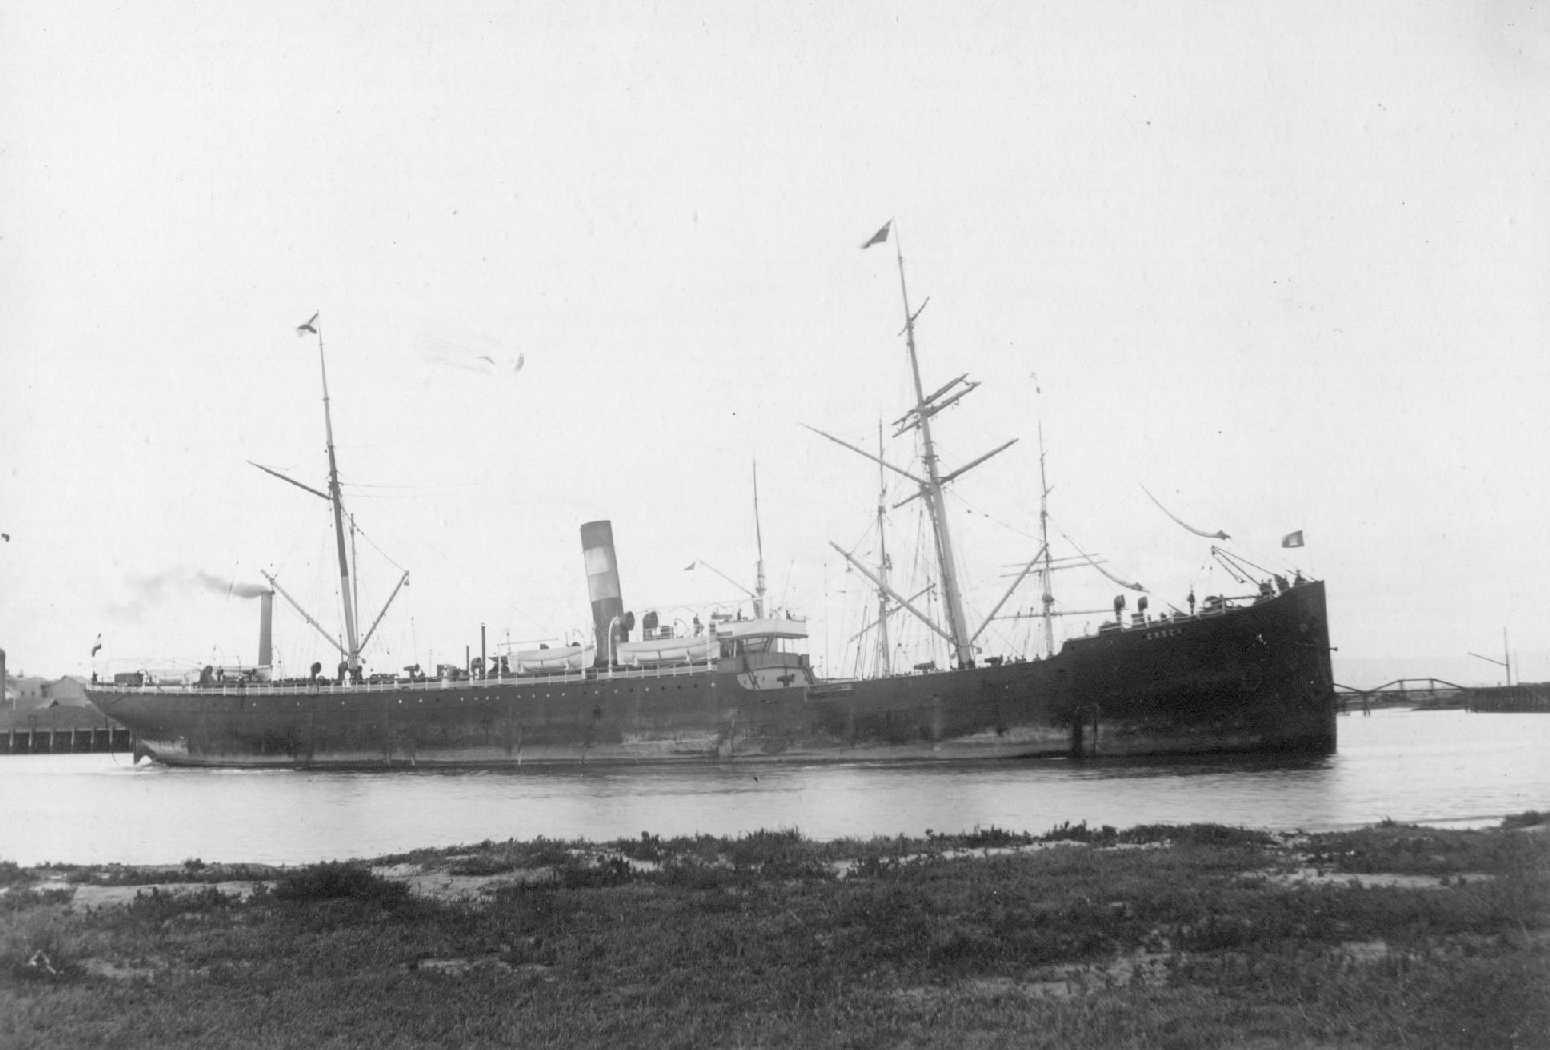 "Freighter ""Essen"", built in 1889 at Flensburg by Schiffs Gesel.  Tonnage:  2985 gross Dimensions:  length 319', breadth 39', draught 24' Port Of Registry:  Hamburg Flag:  German"